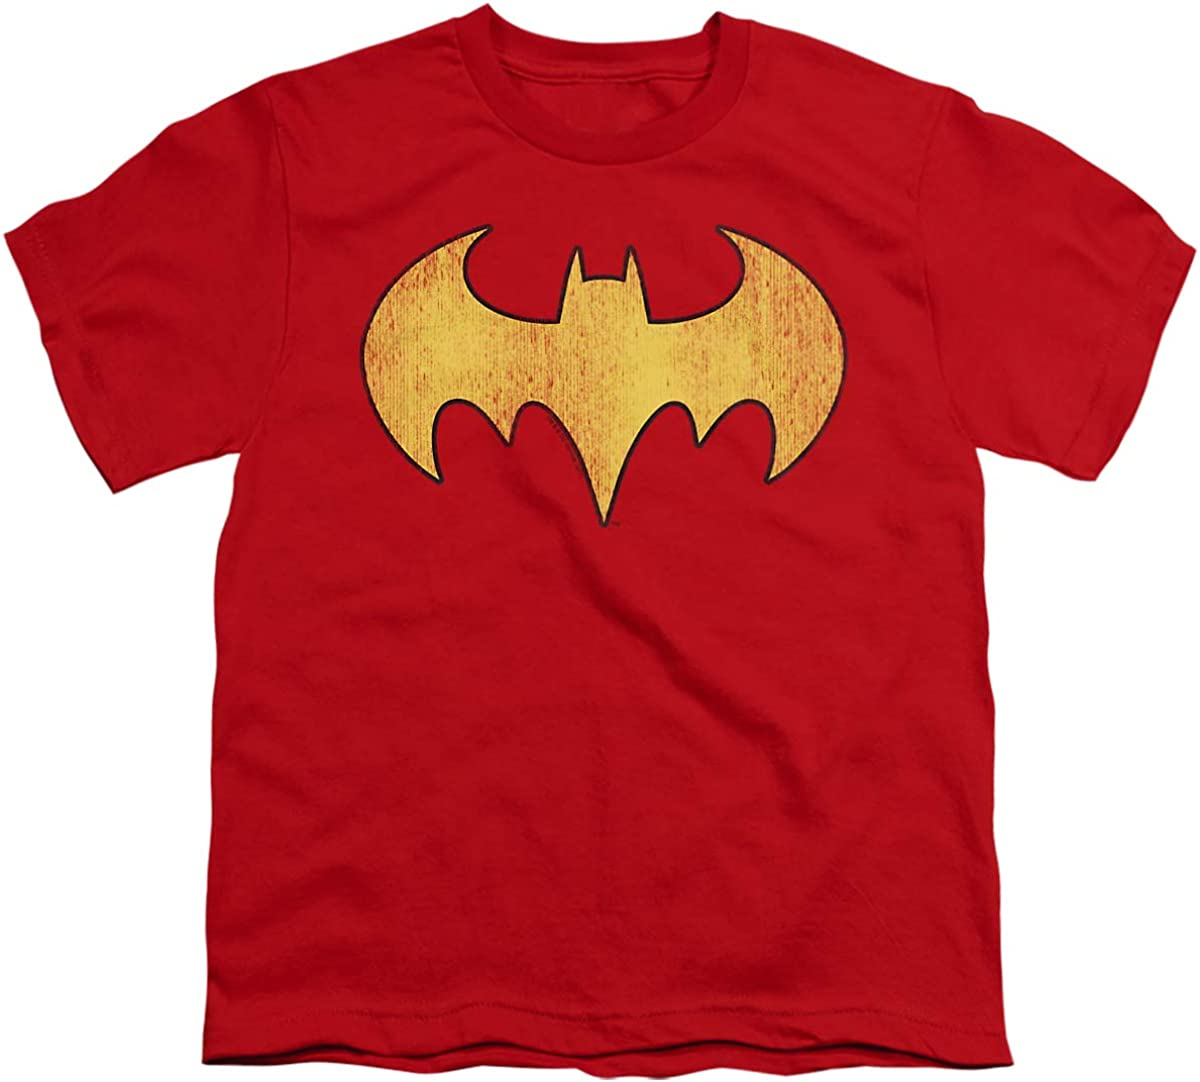 DC Batgirl Logo Distressed Unisex Youth T Shirt, Red, X-Large